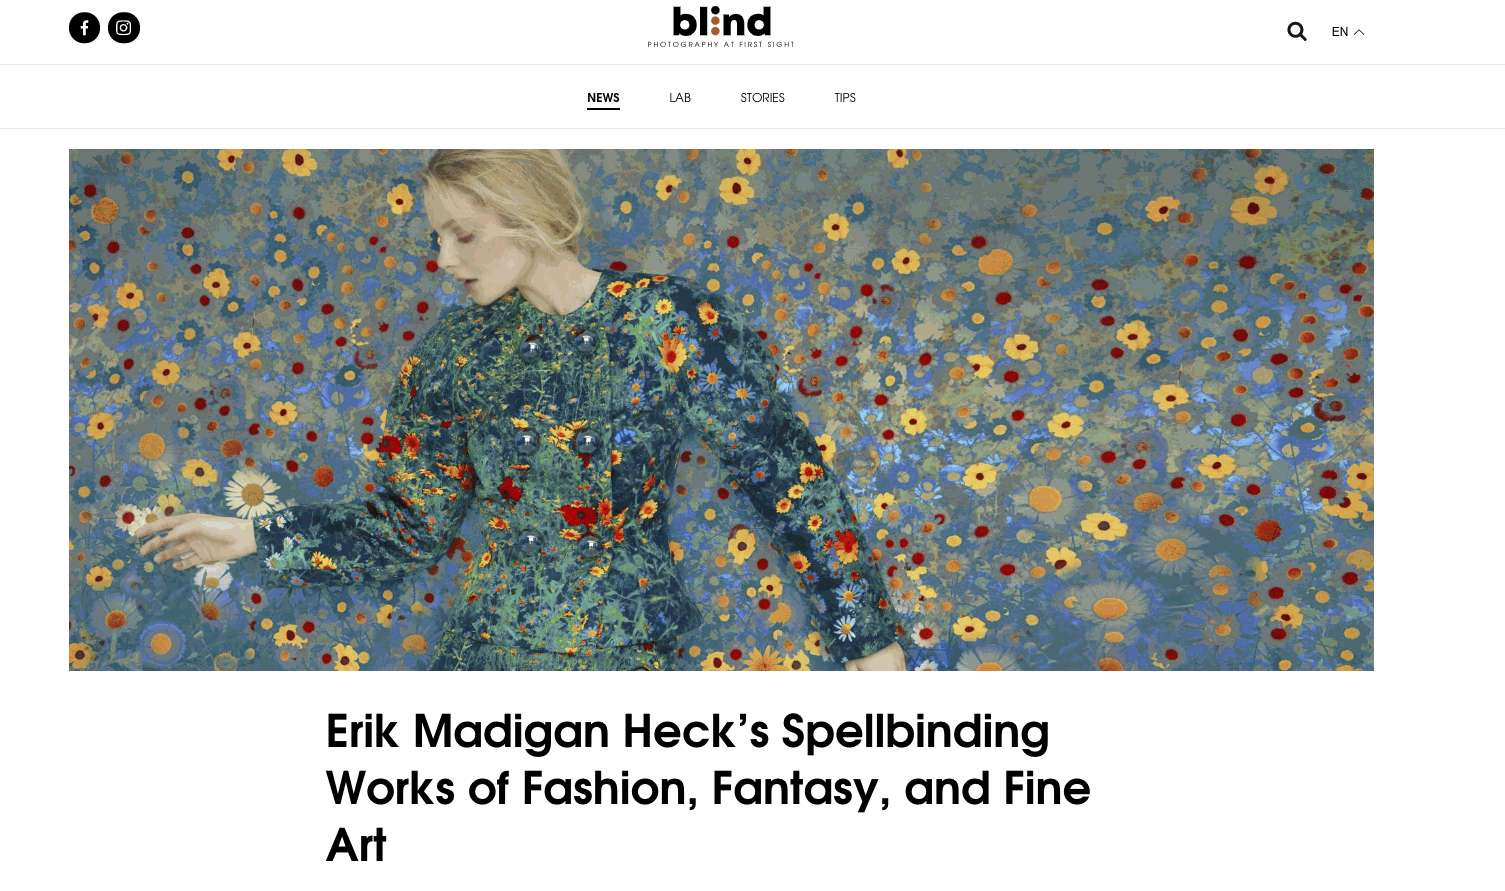 Erik Madigan Heck's Spellbinding Works of Fashion, Fantasy, and Fine Art